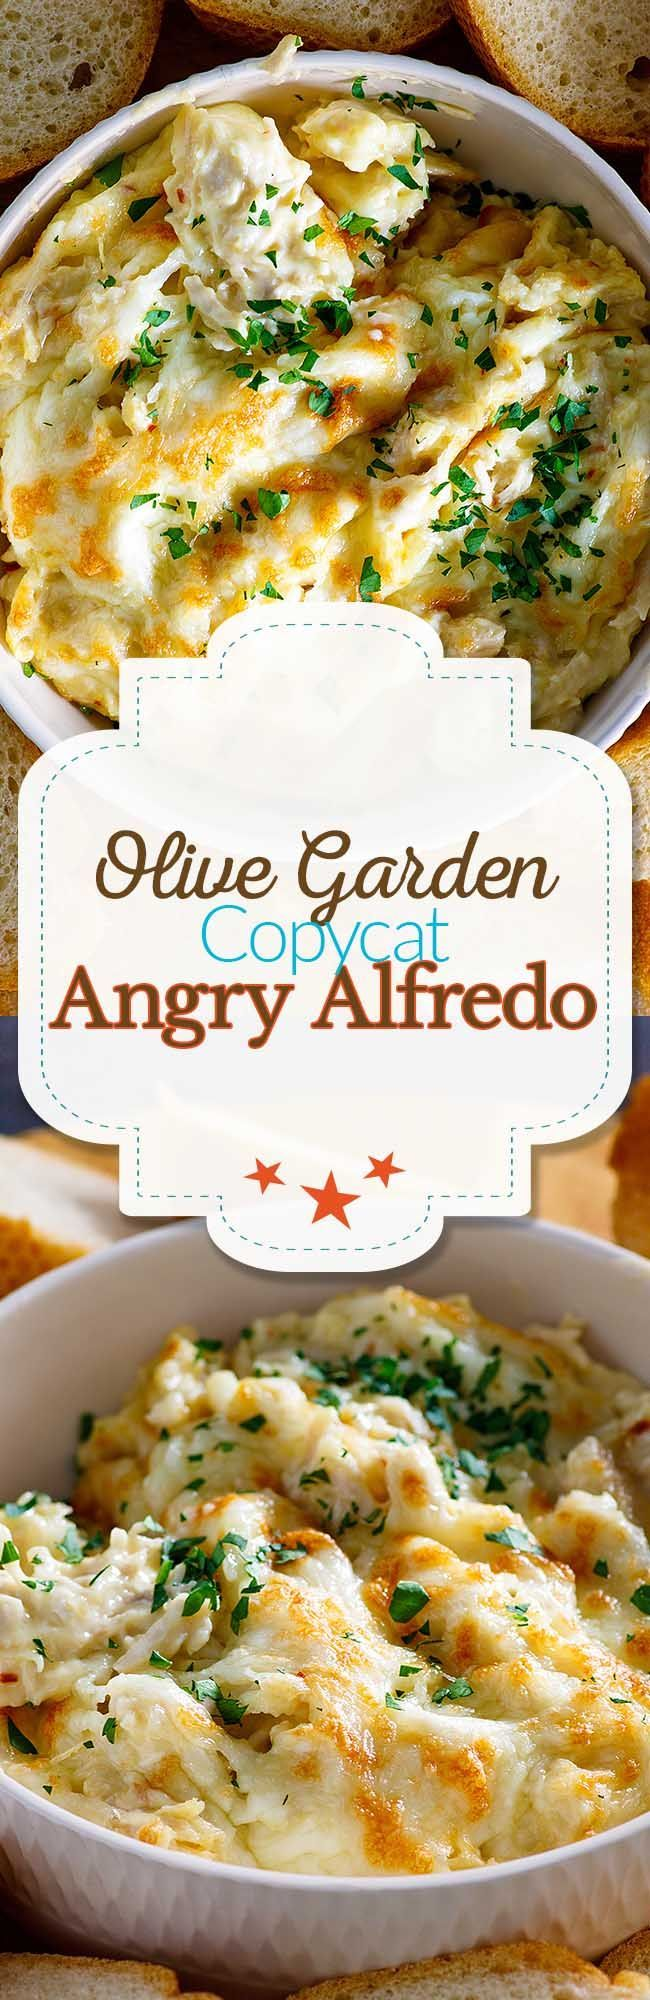 Copycat Olive Garden Angry Alfredo Recipe Food recipes